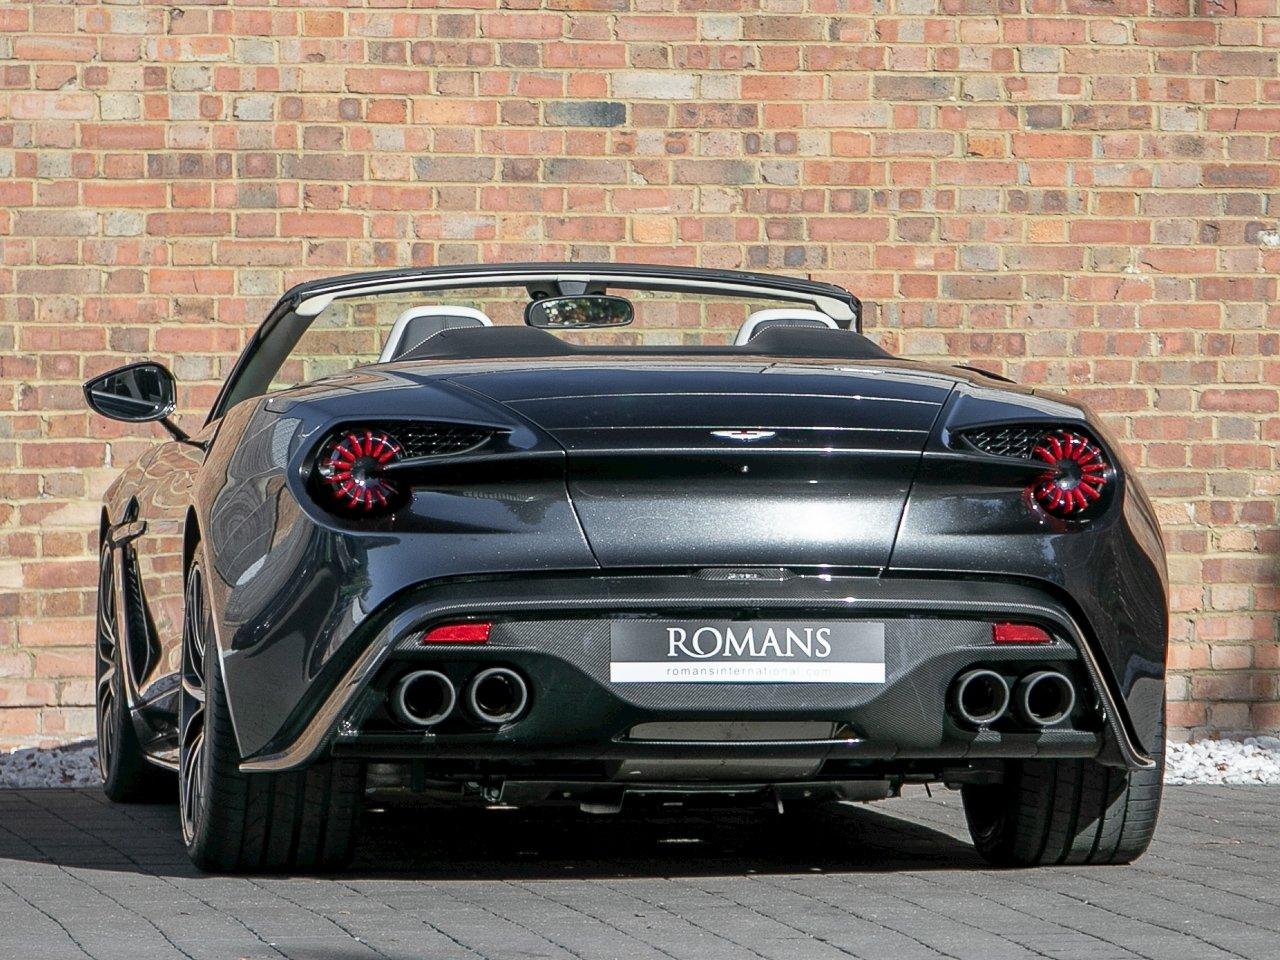 Este Aston Martin Vanquish Zagato Volante Rarissimo Vai A Leilao Carzoom